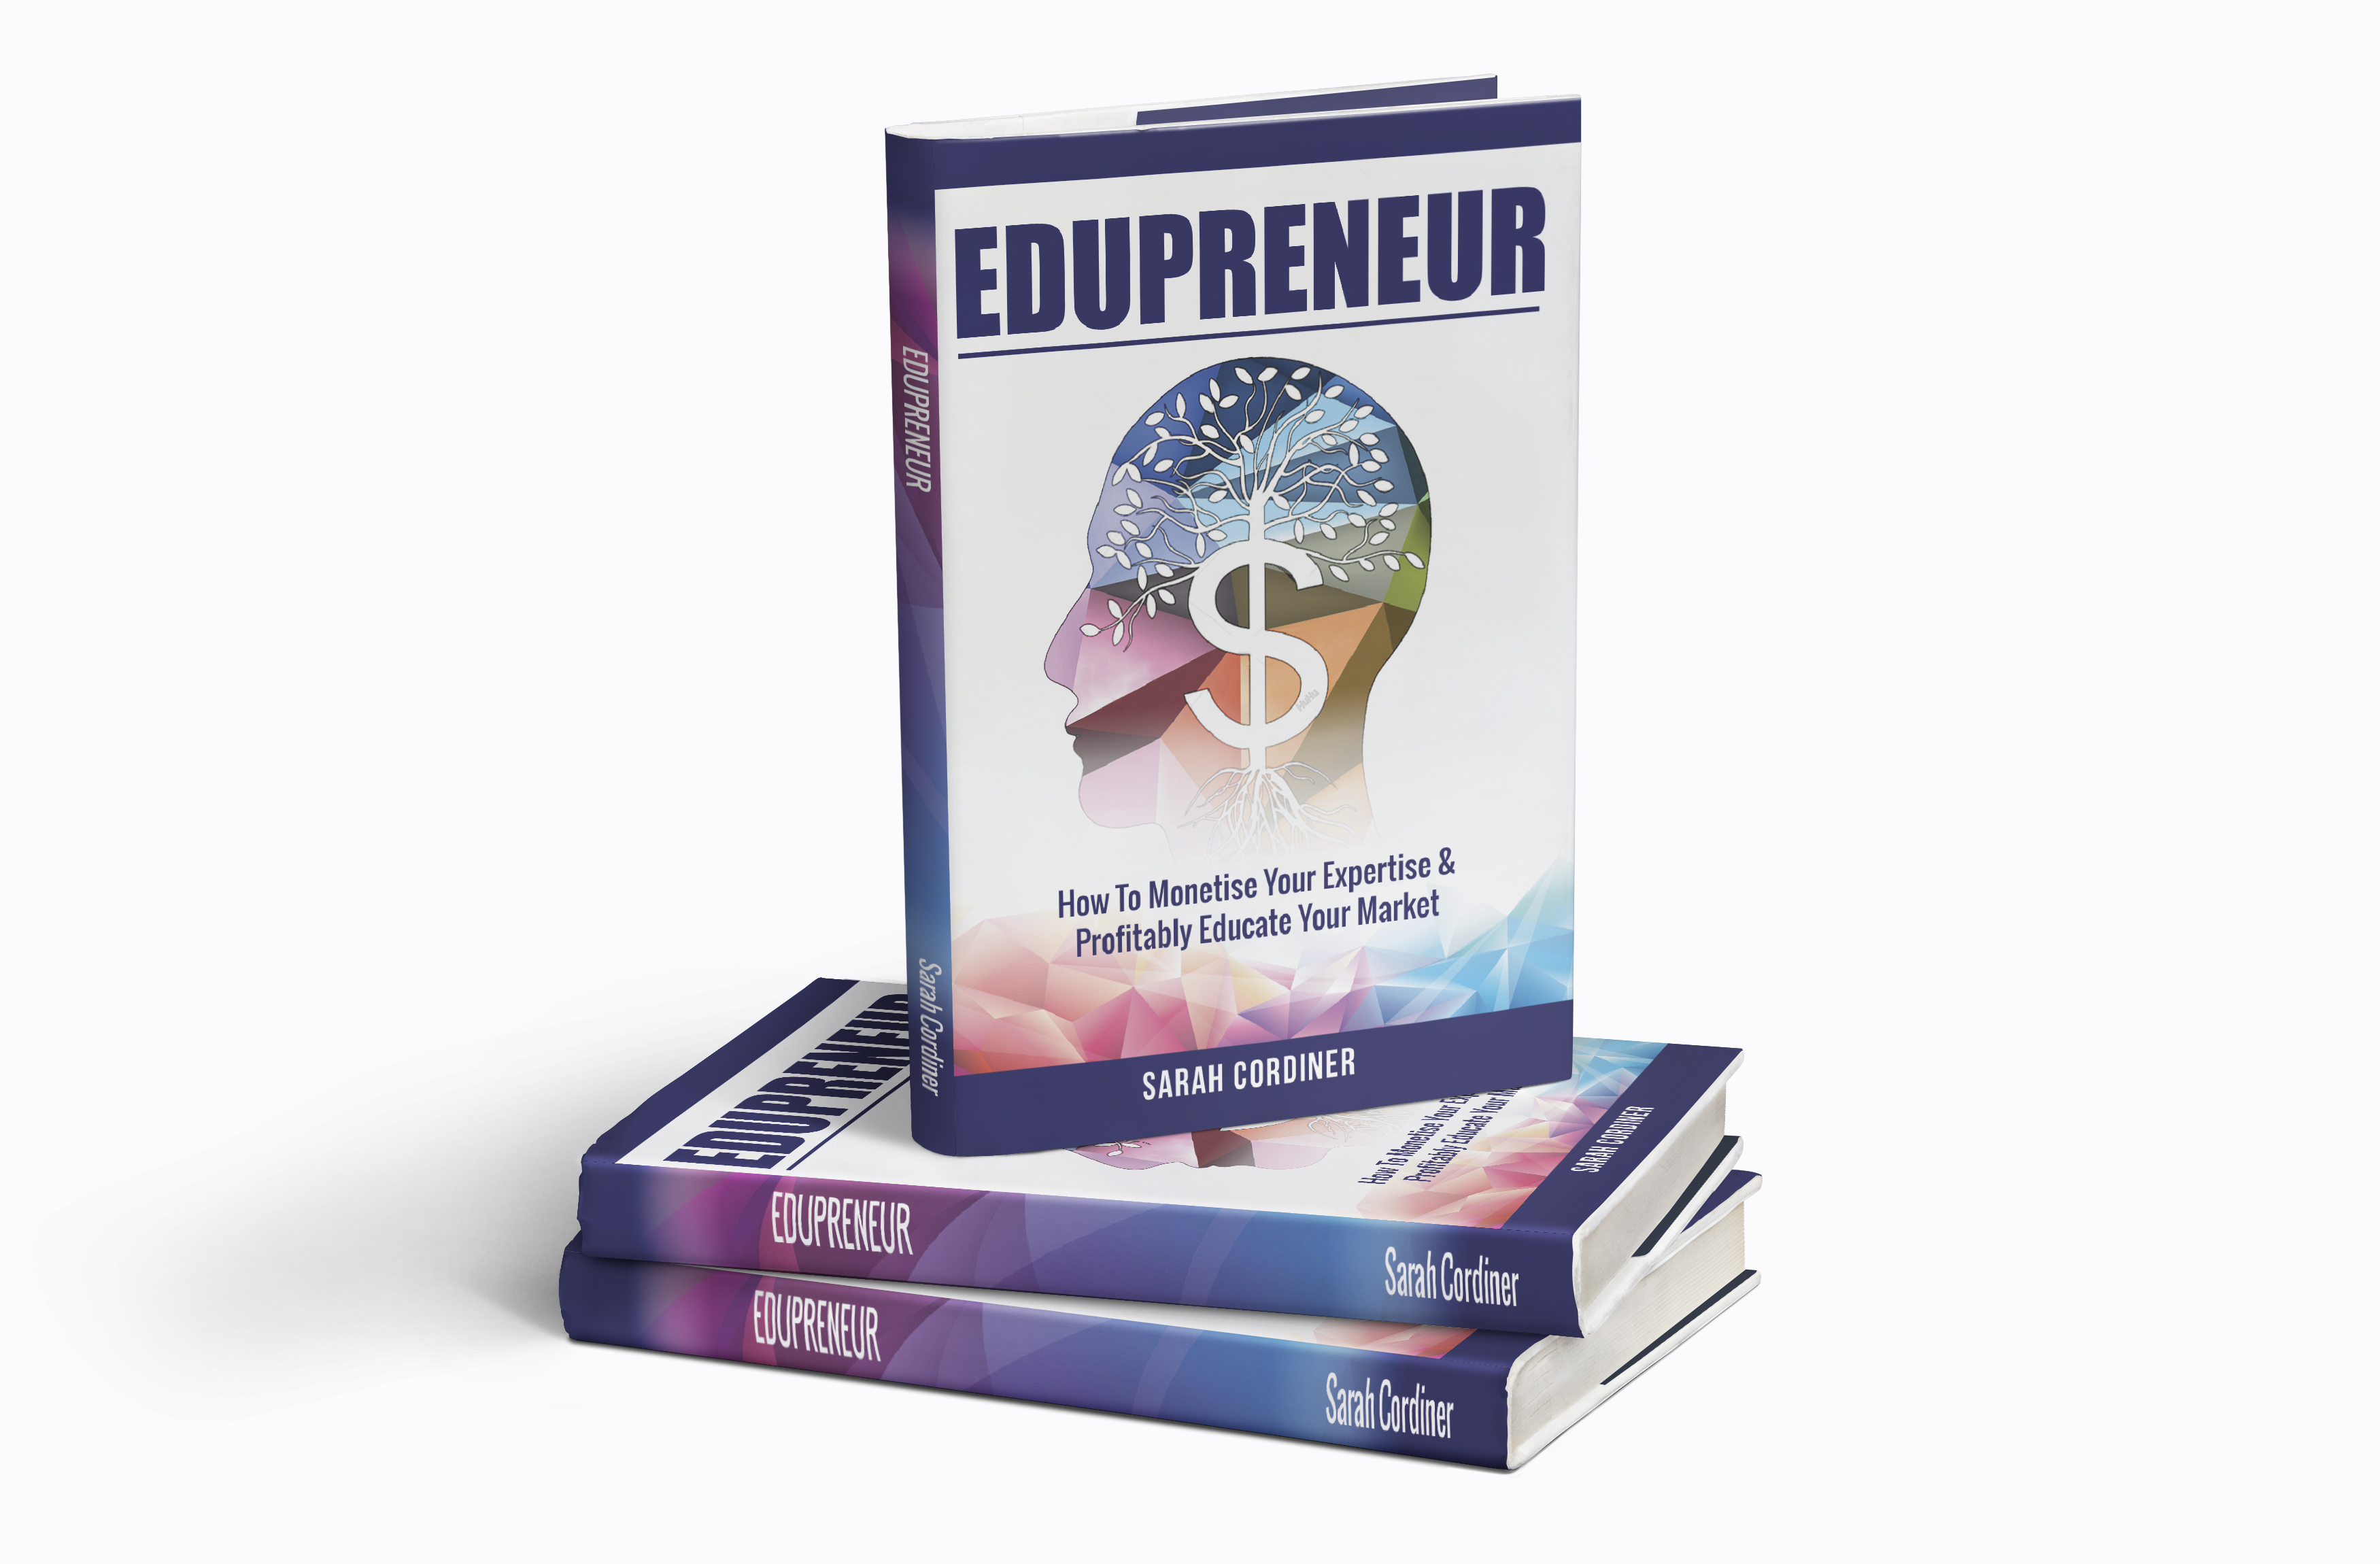 edupreneur front cover book 3d image